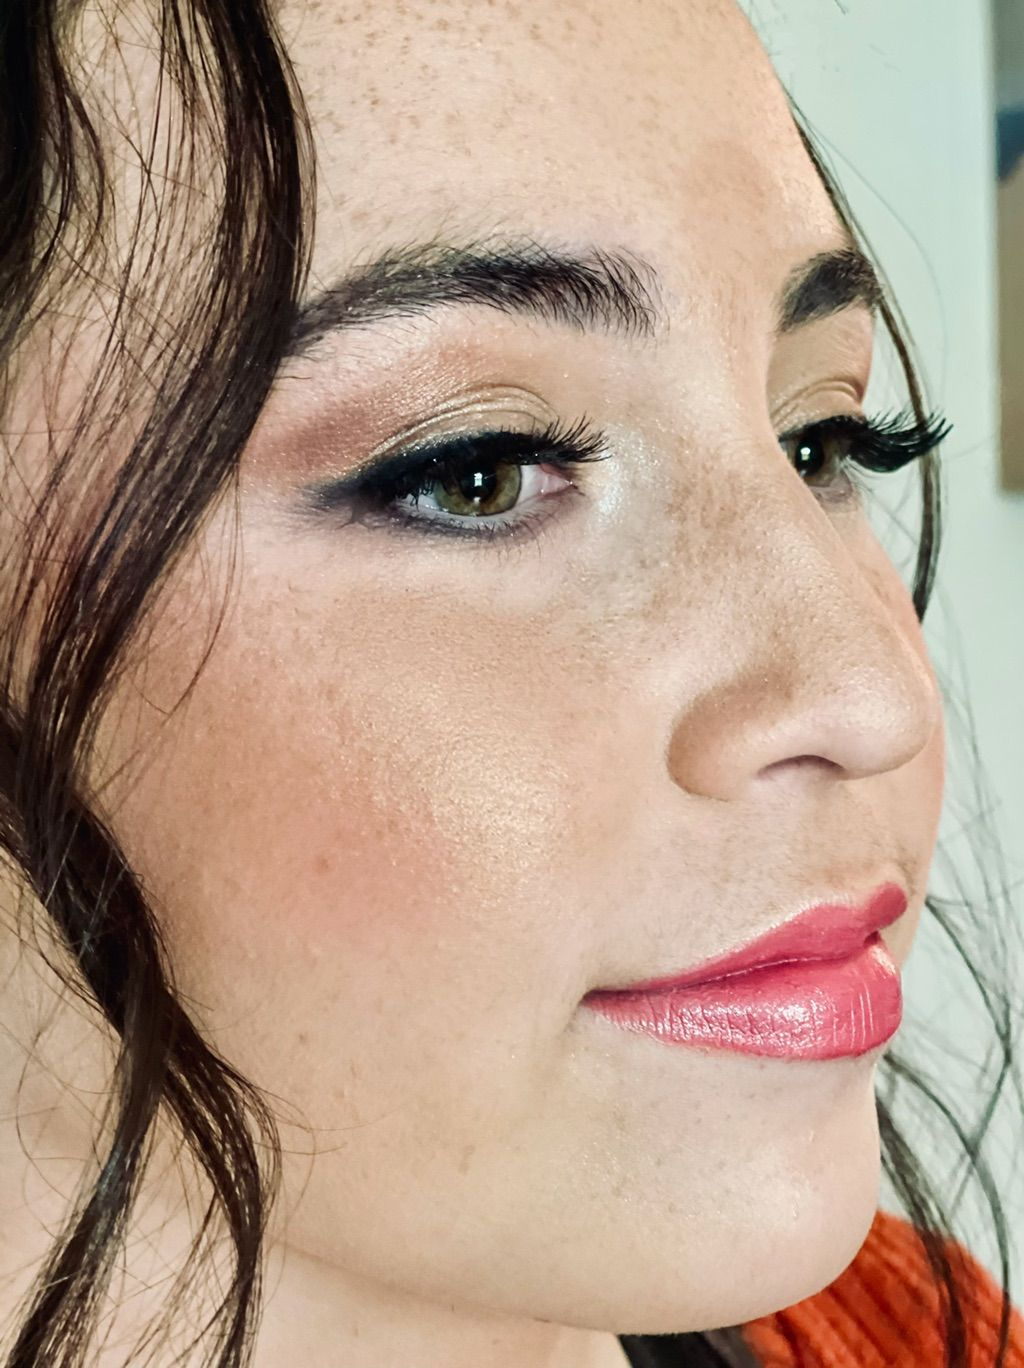 Makeup Artistry by Sharikbeauty